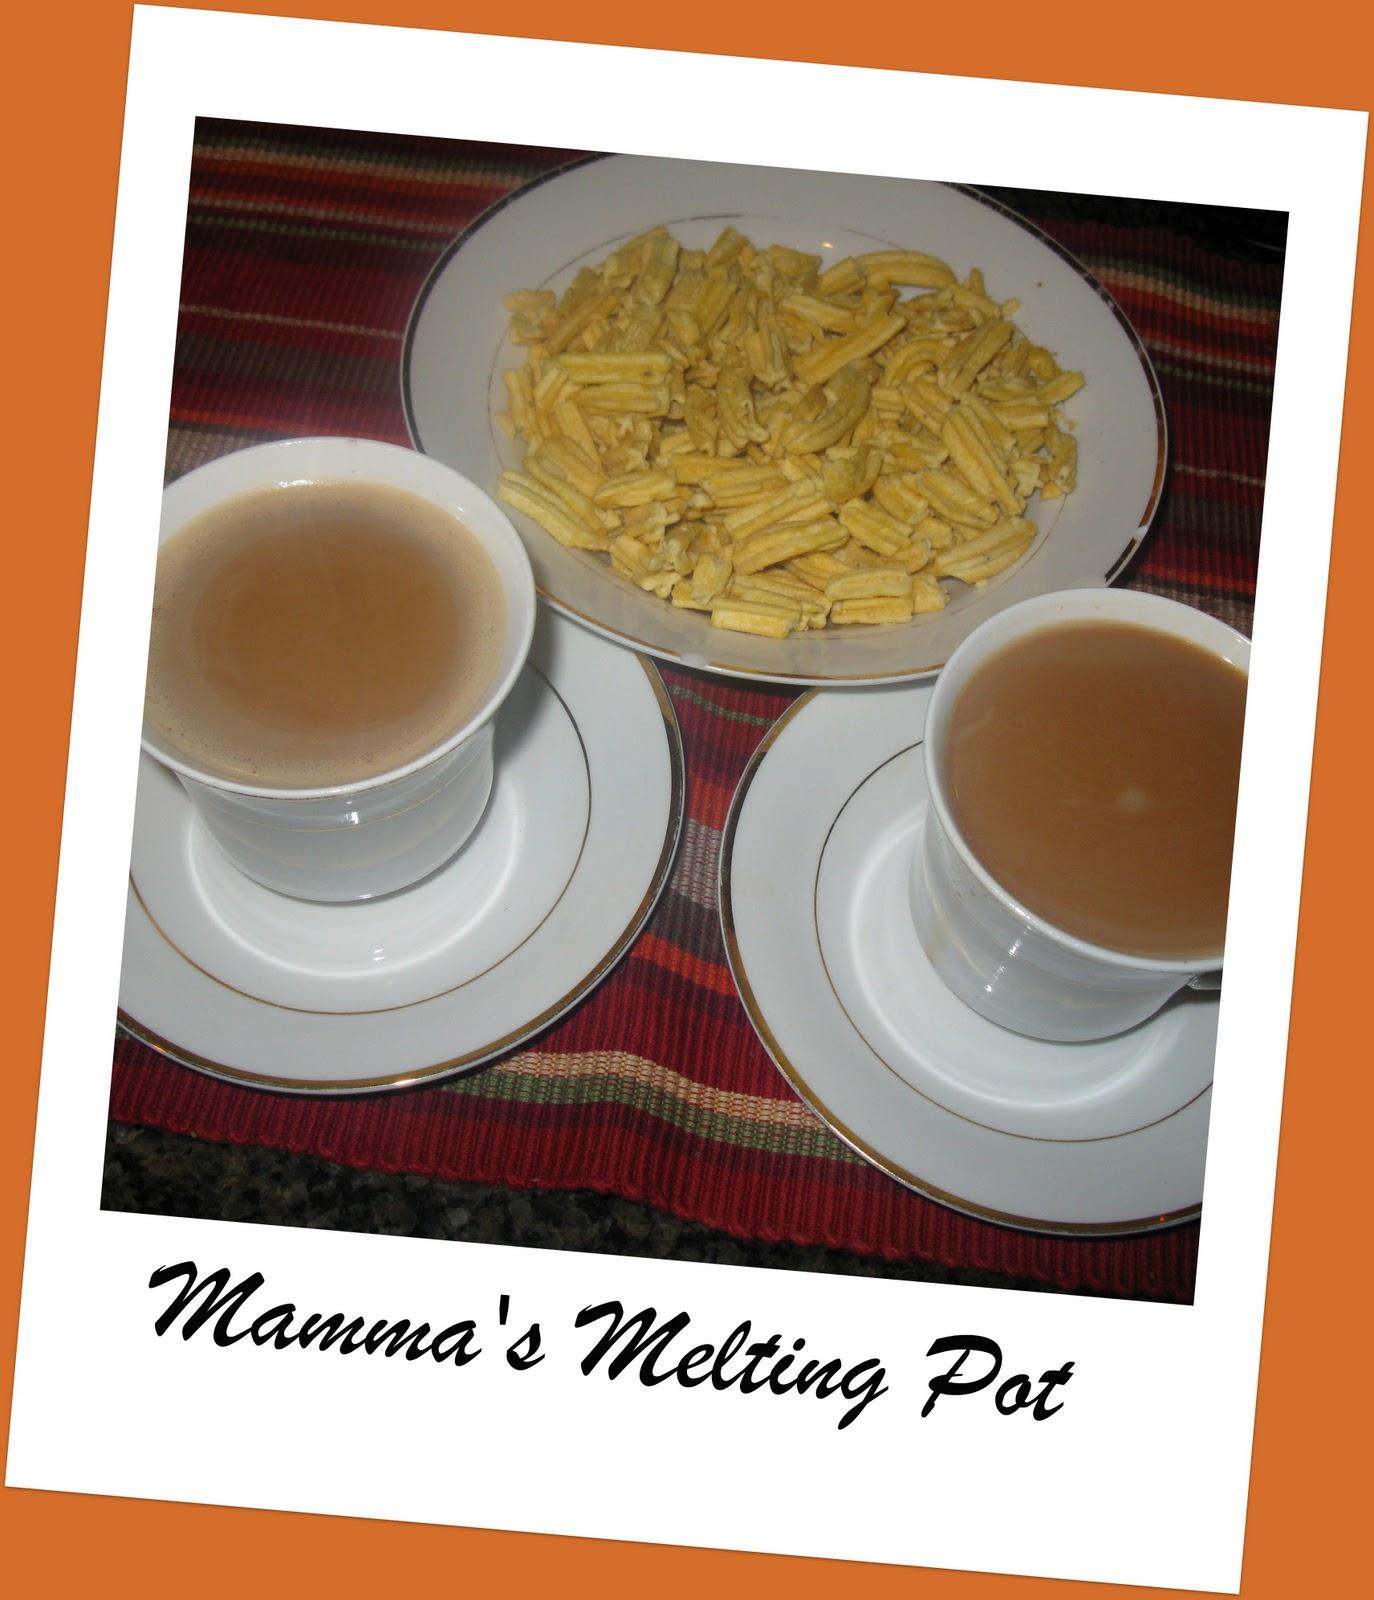 Mamma's Melting Pot: Tea Aka Chai---Desi Ishtyle: An